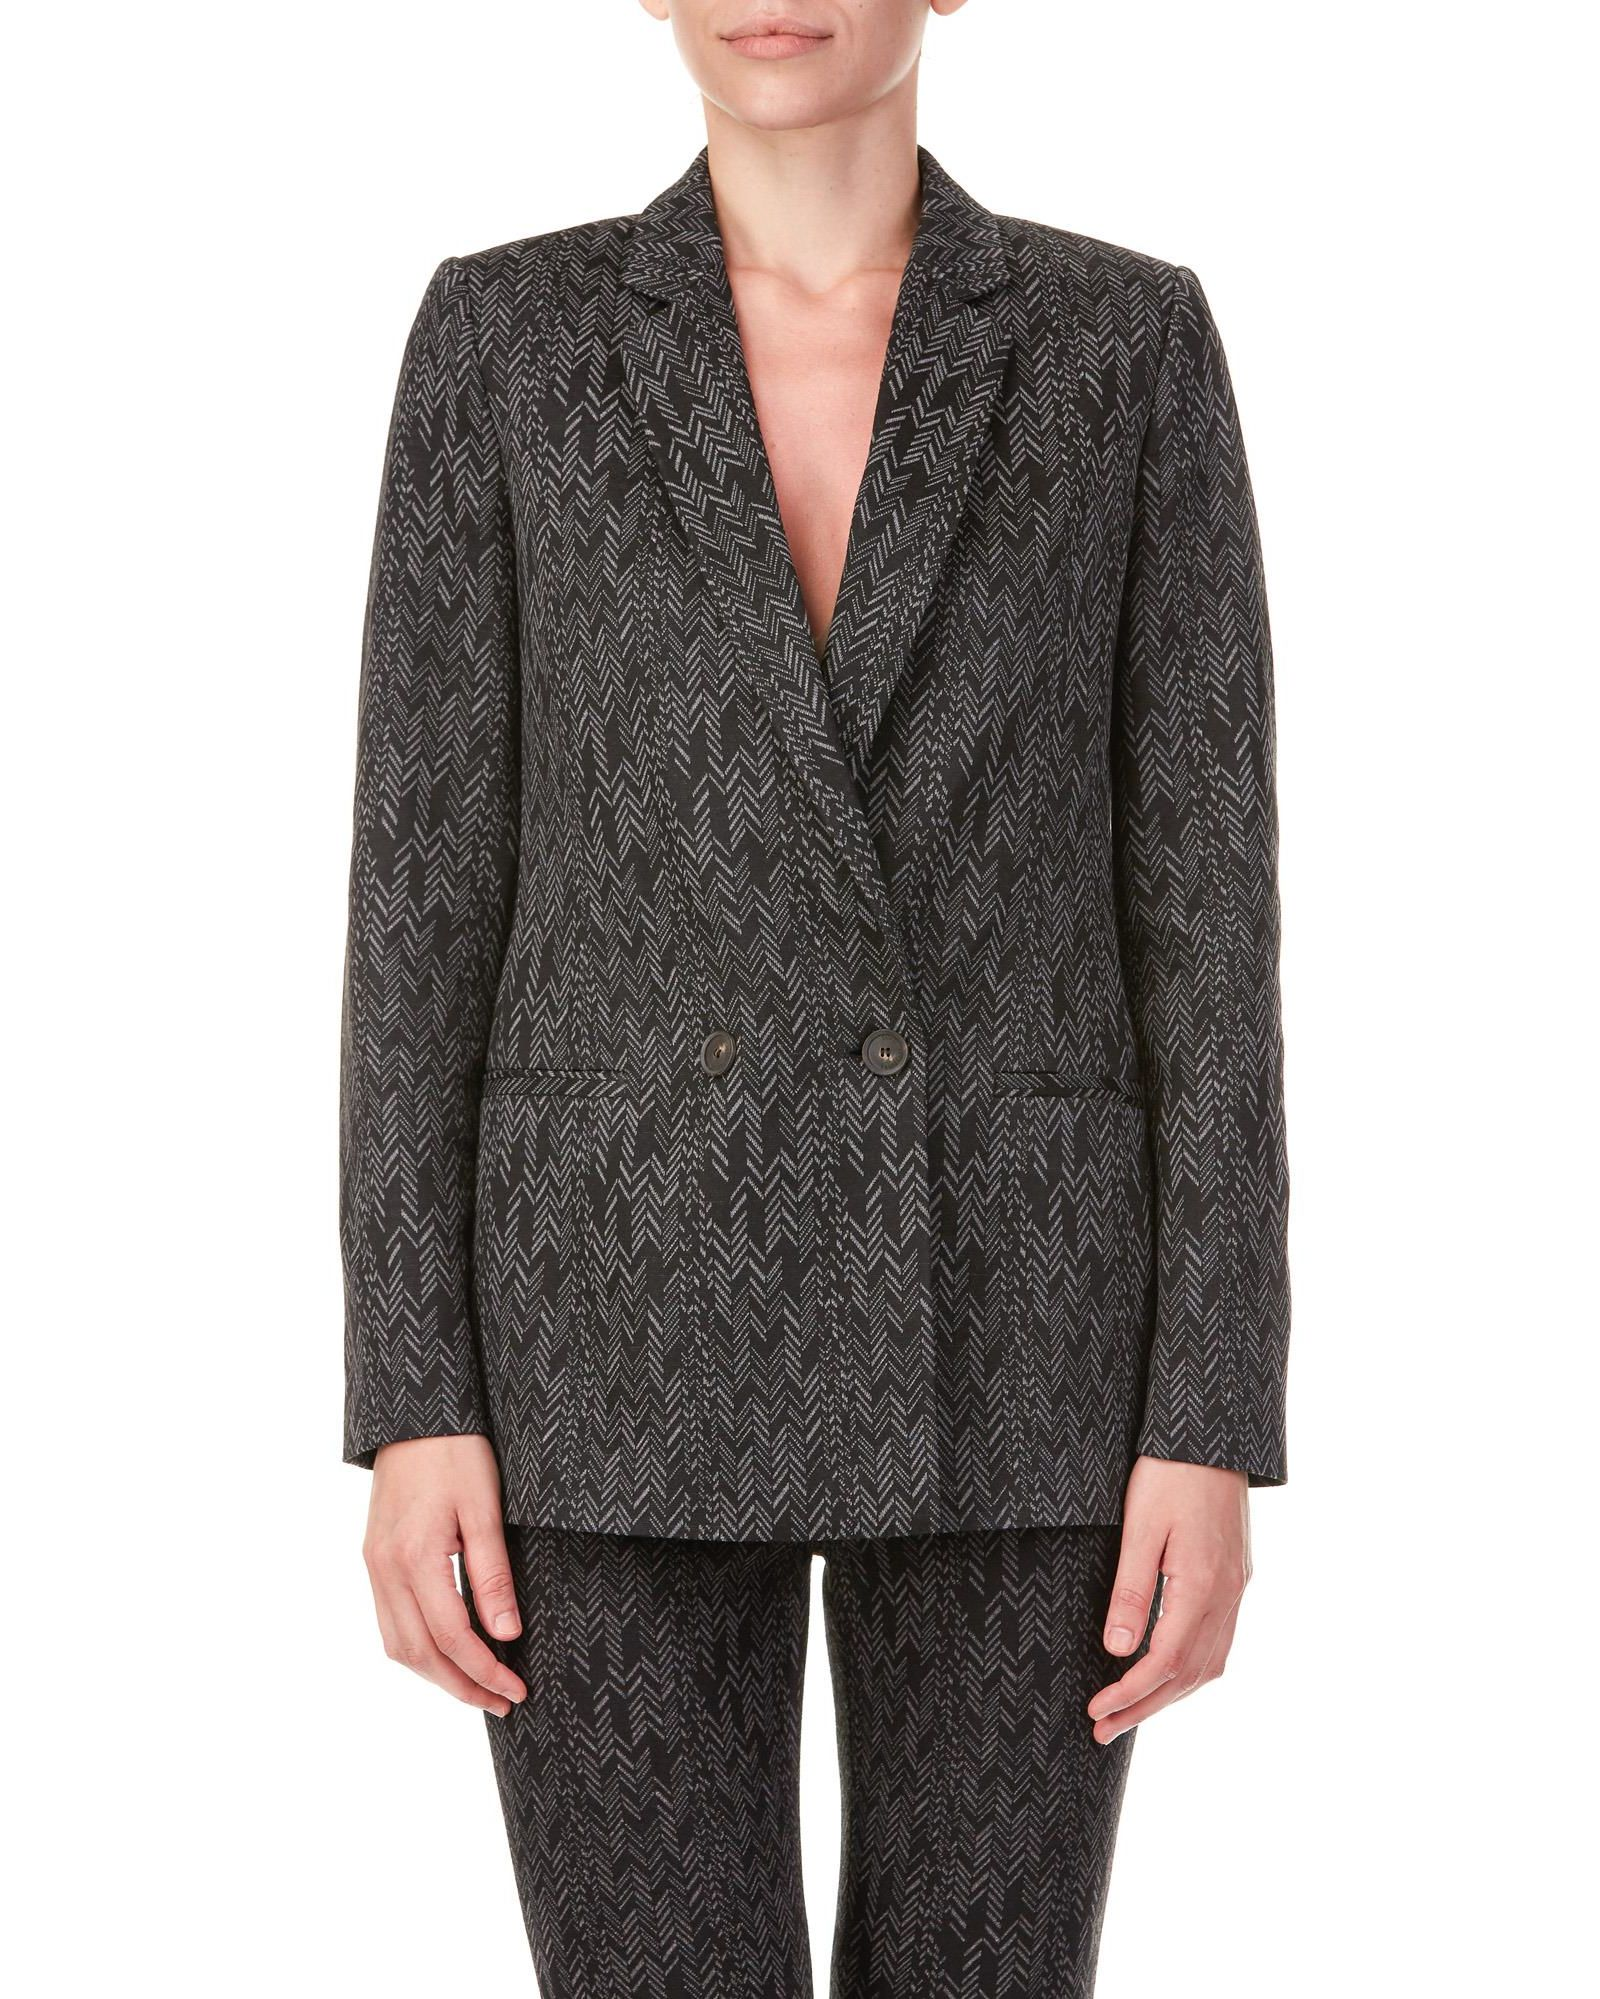 TRUSSARDI Blazer in Black - Grey